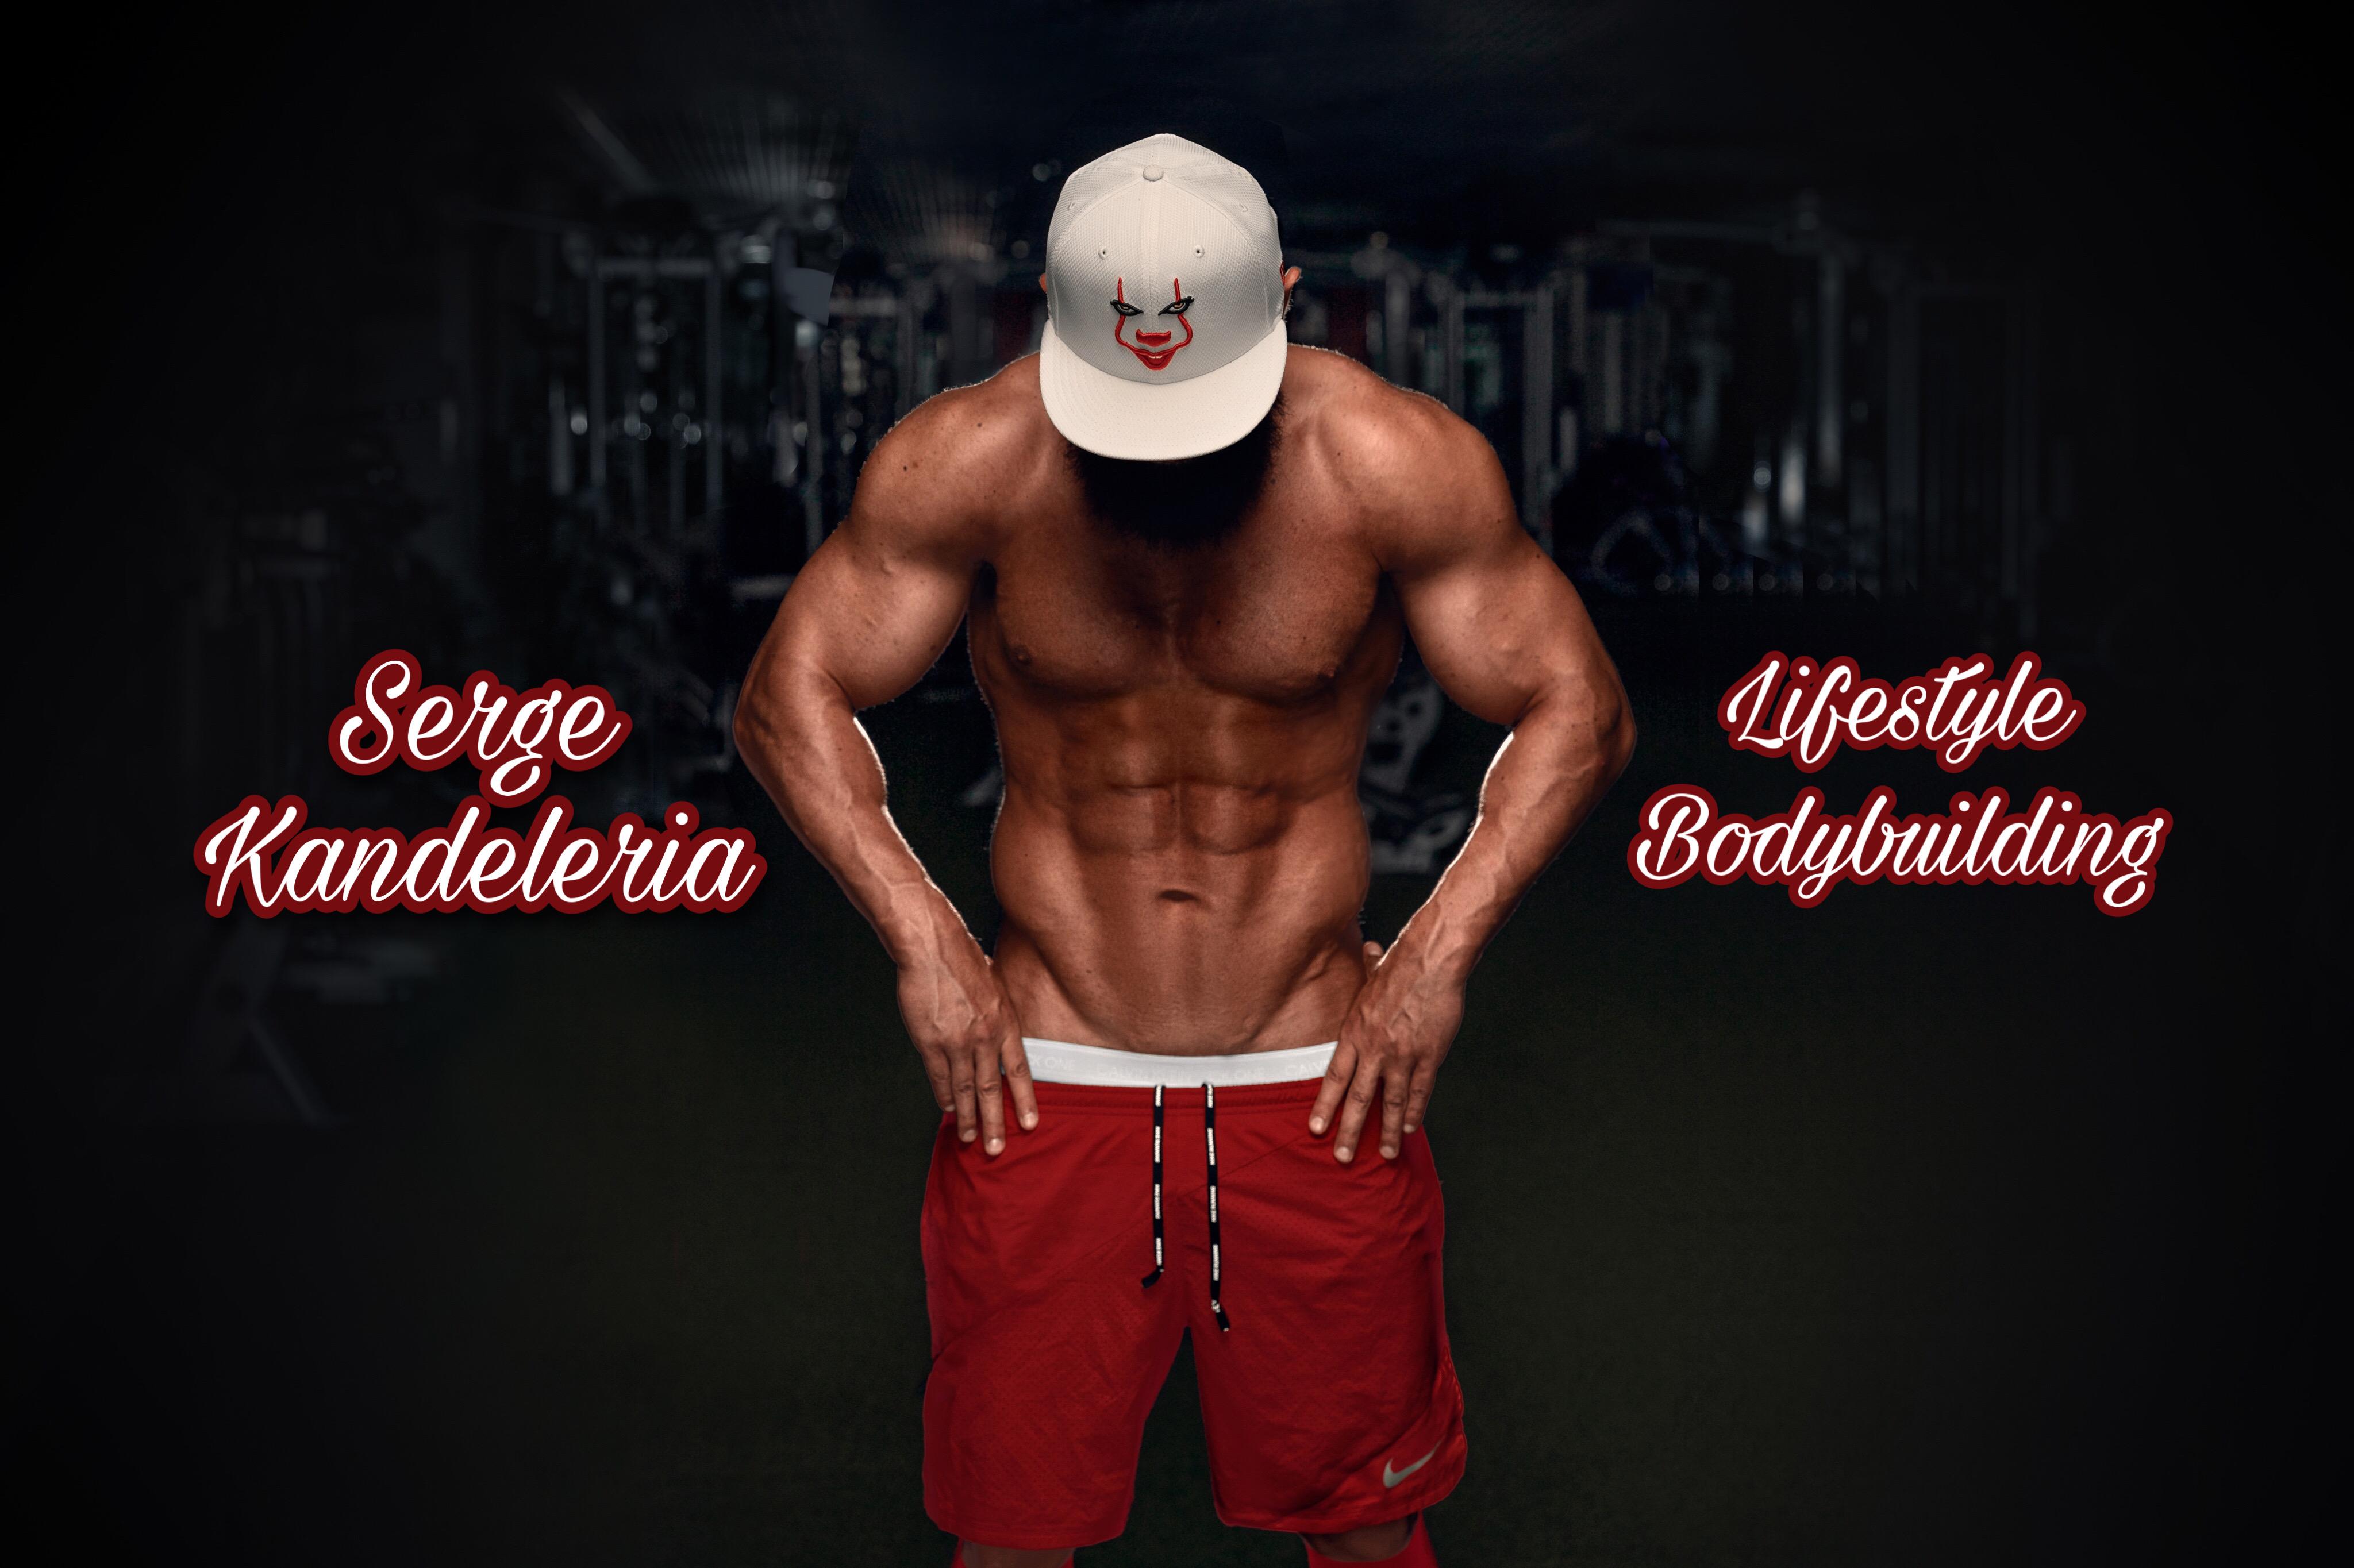 Serge Kandeleria, Сергей Соклаков, Lifestyle Bodybuilding, Лайфстайл Бодибилдинг